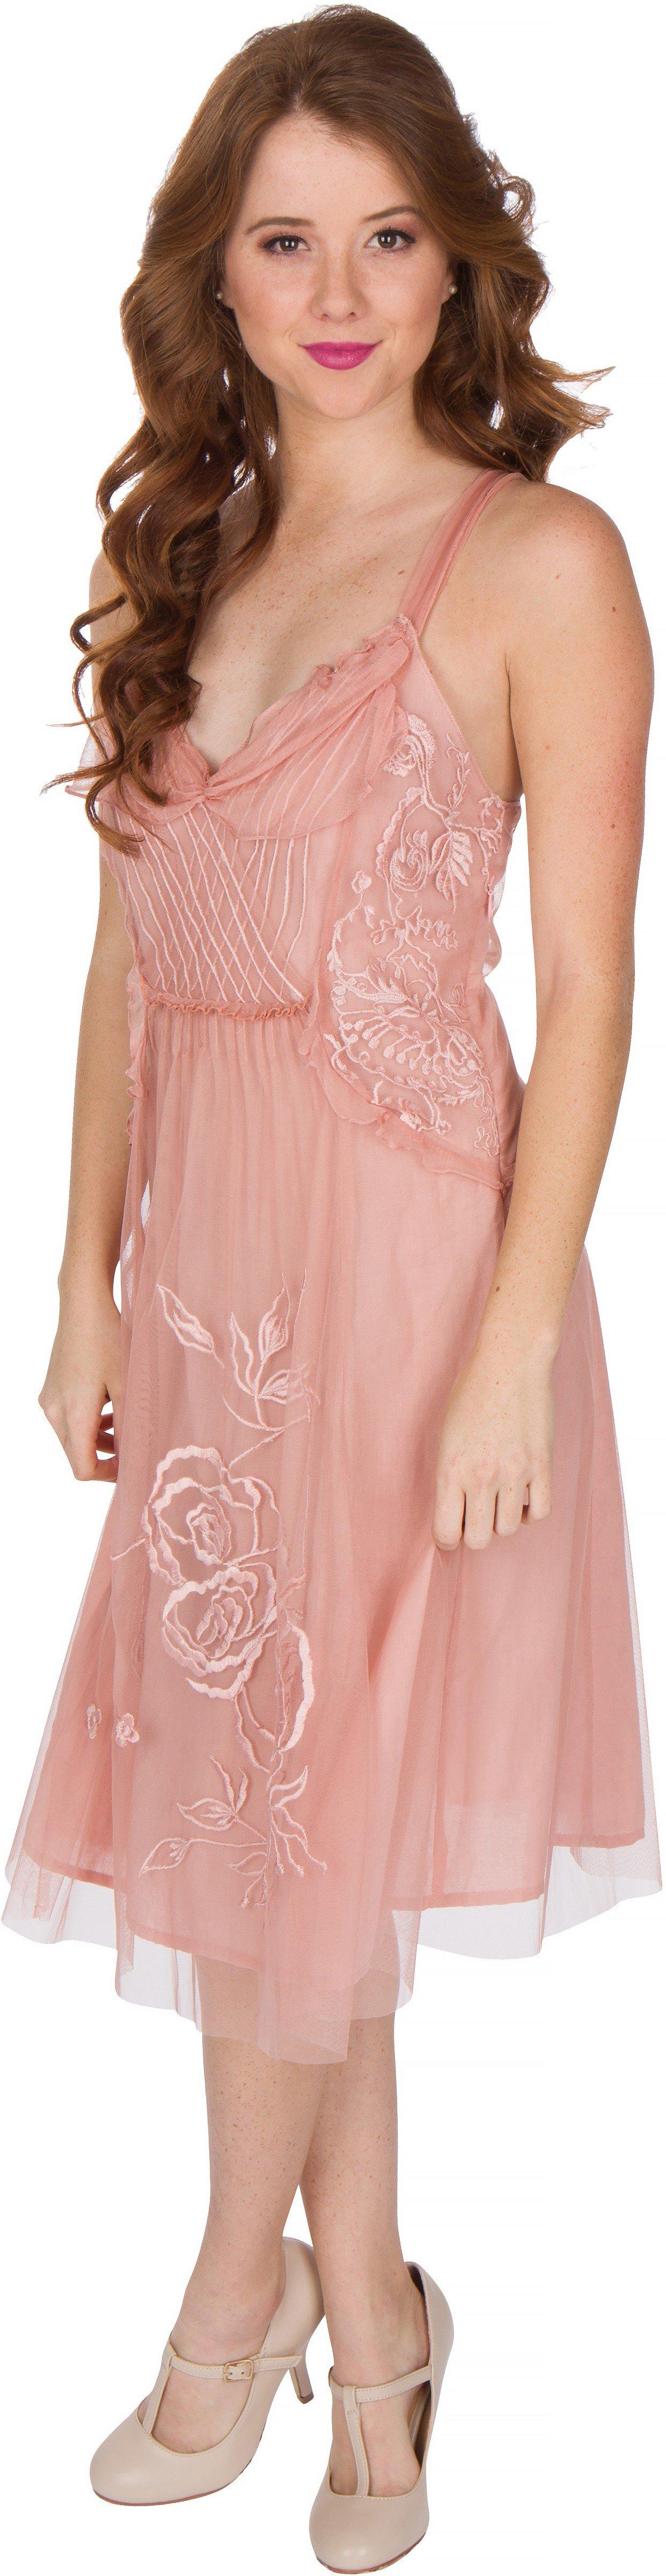 1920s Day Dresses, Tea Dresses, Garden Party Dresses | Gatsby dress ...